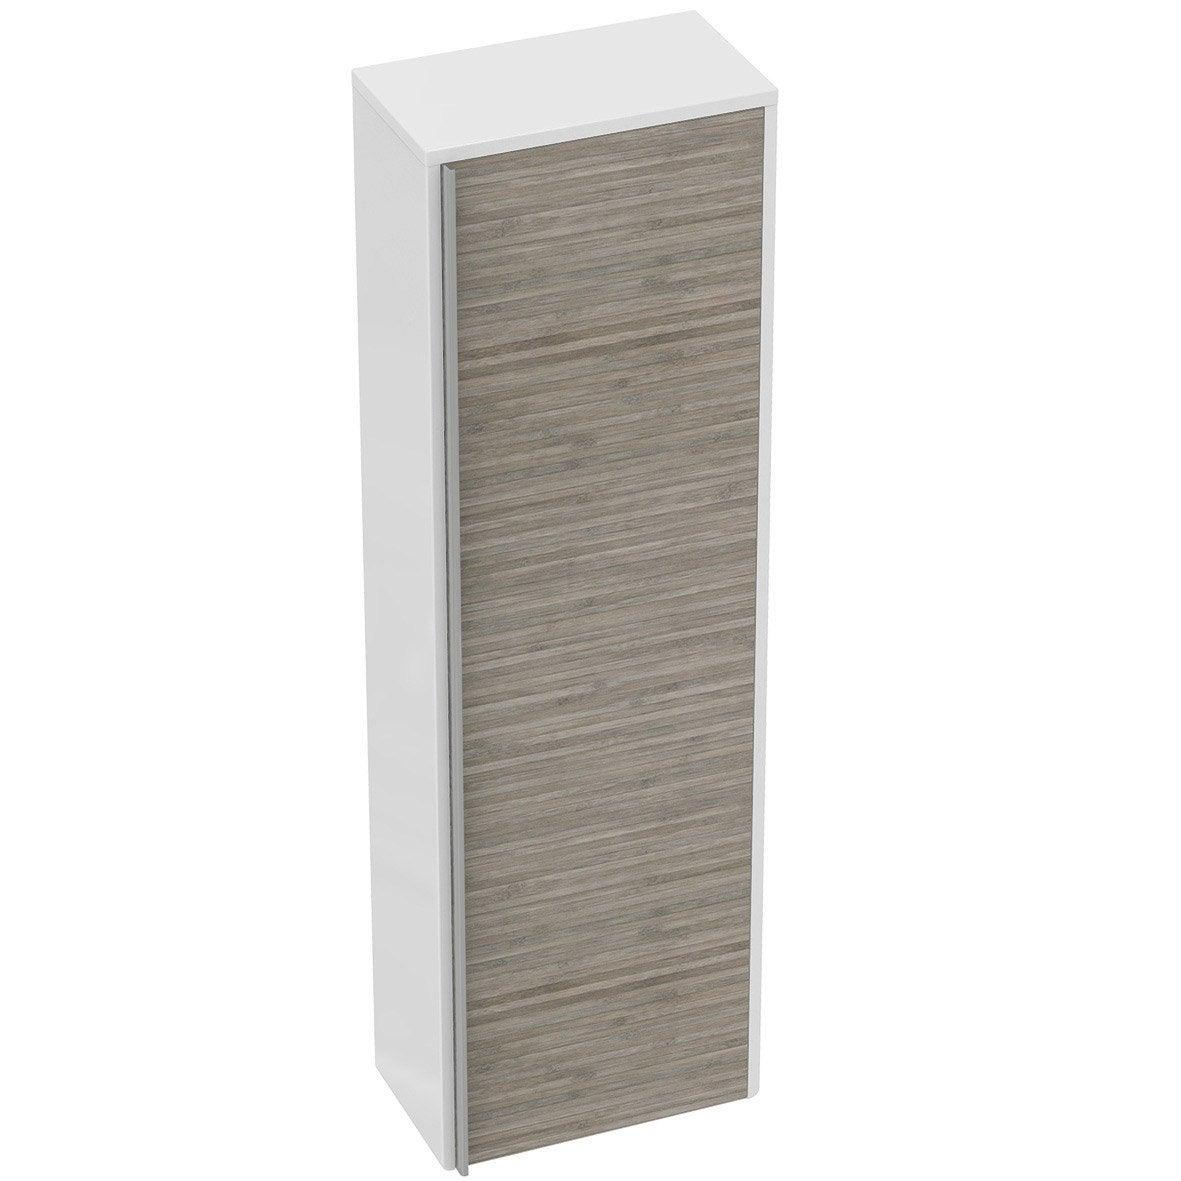 meuble demi colonne ideal standard idealsmart imitation. Black Bedroom Furniture Sets. Home Design Ideas